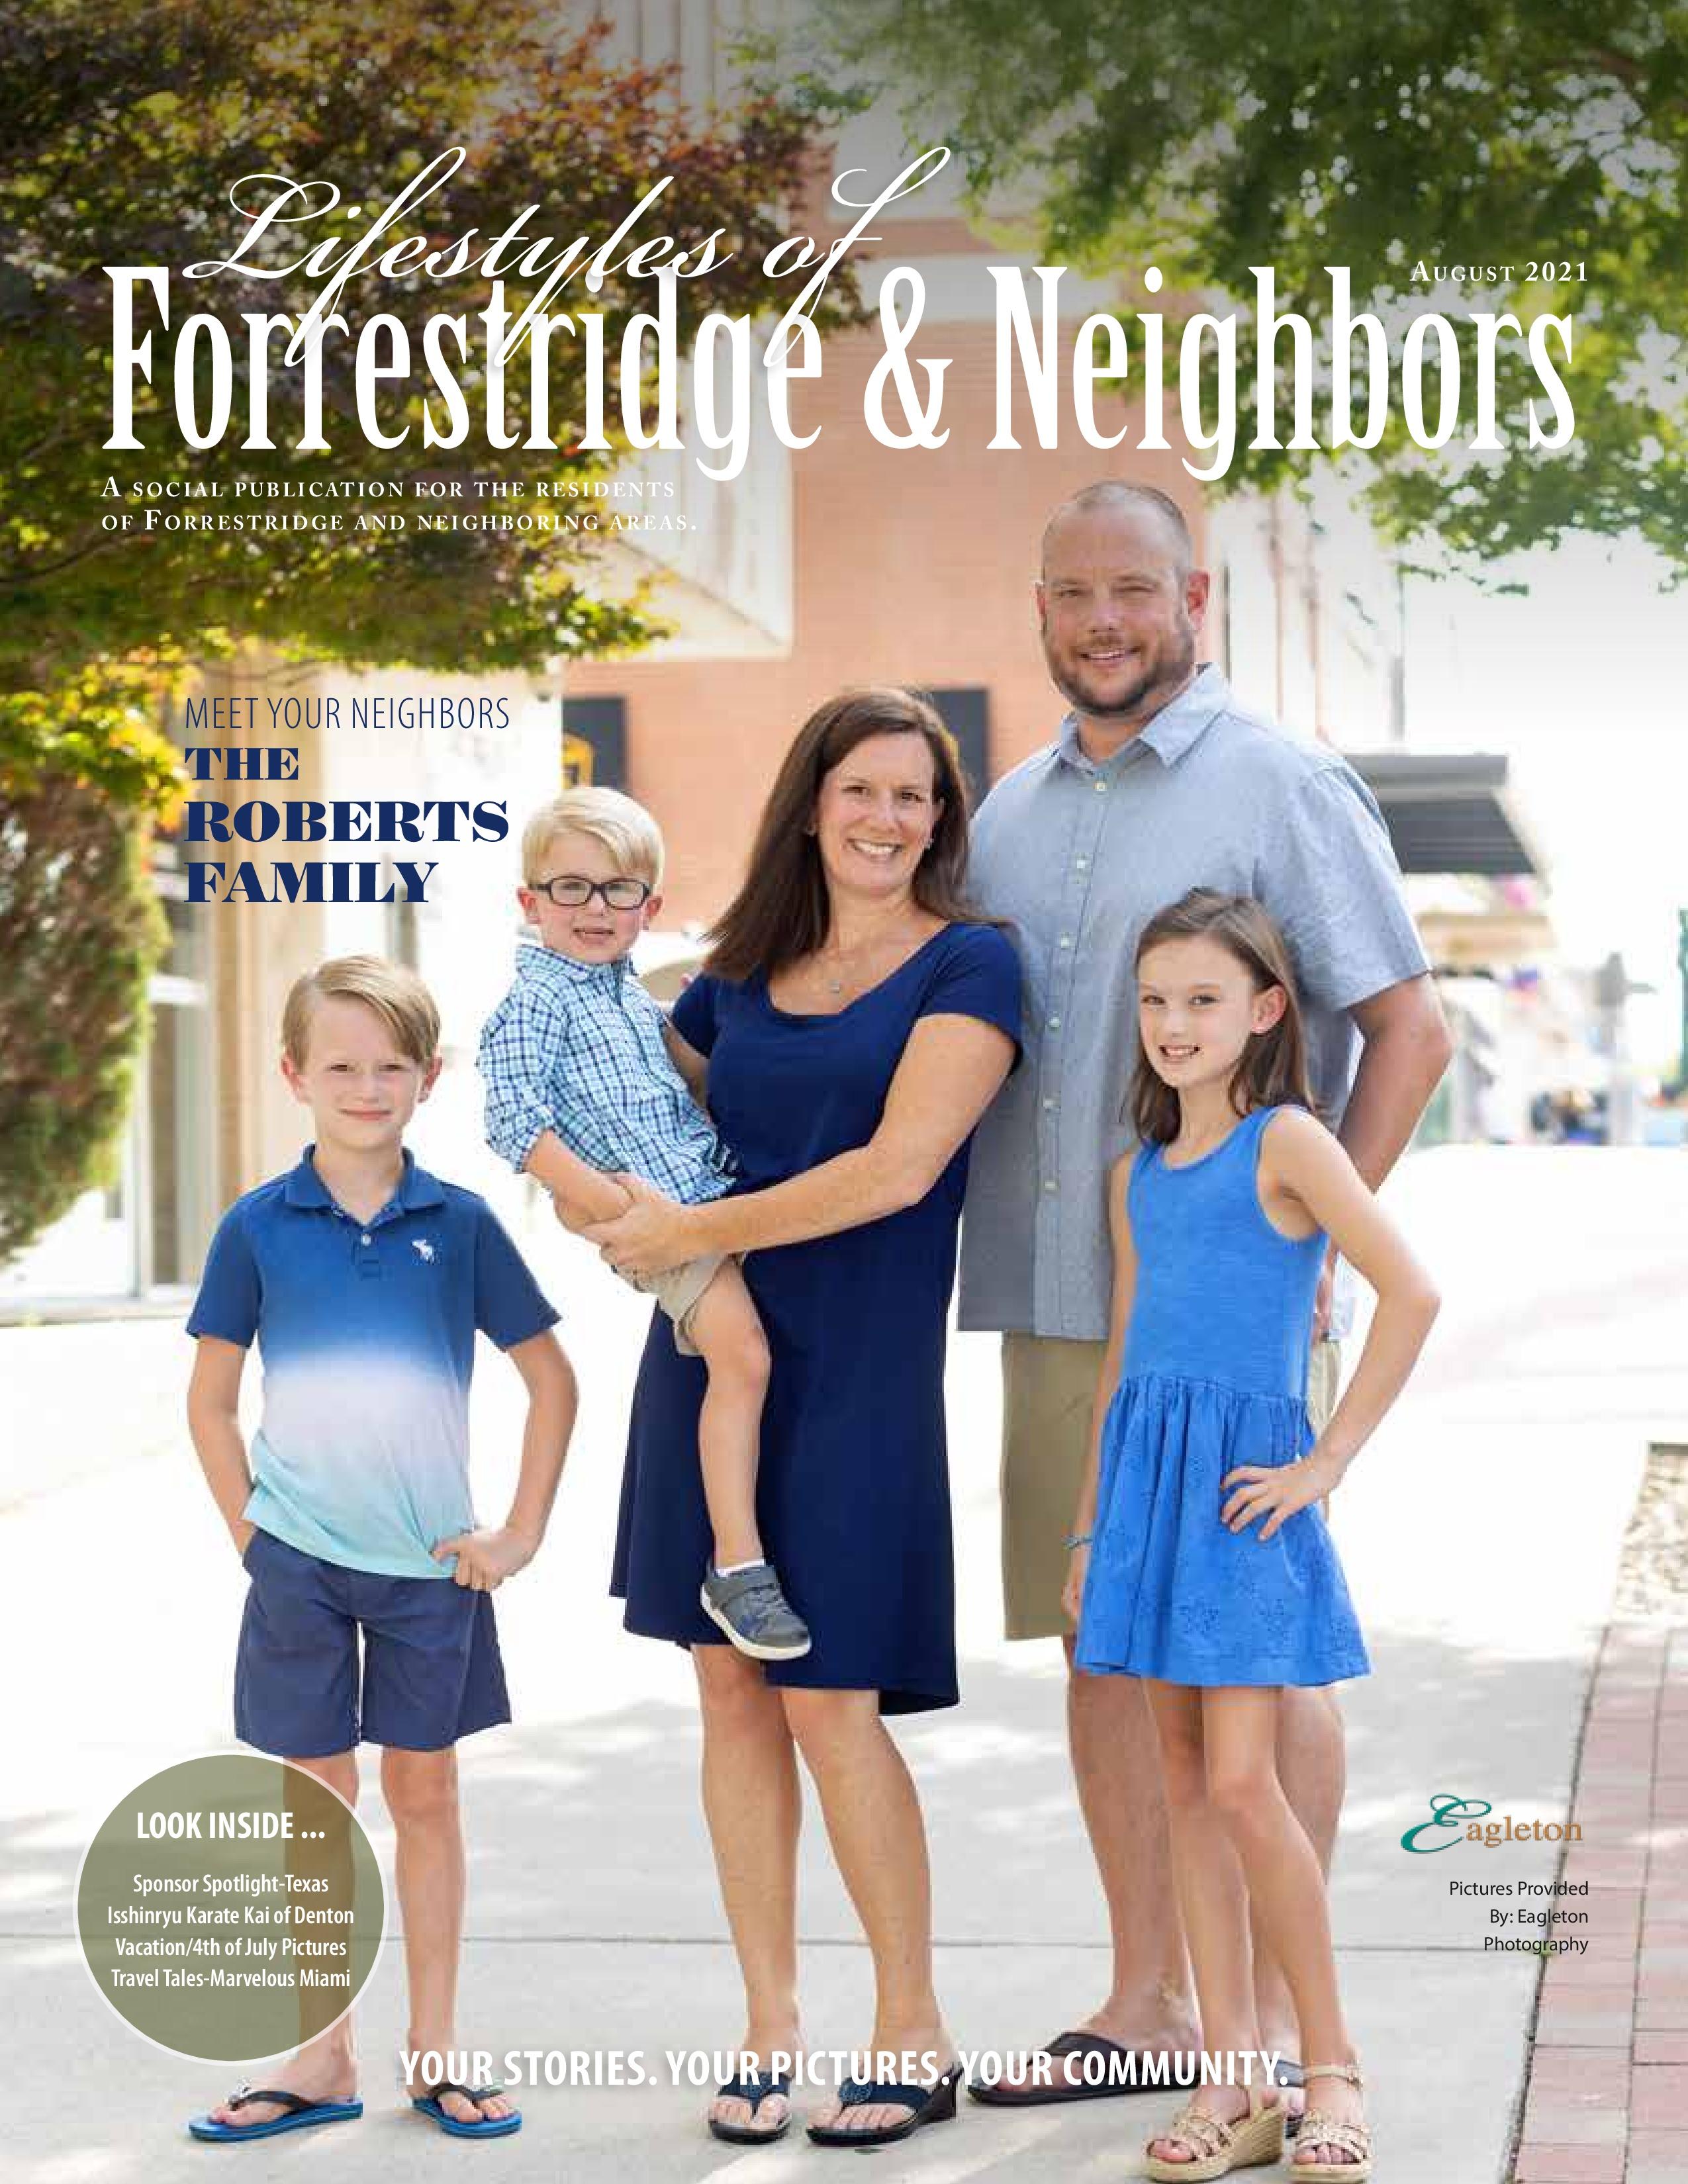 Lifestyles of Forrestridge and Neighbors 2021-08-01